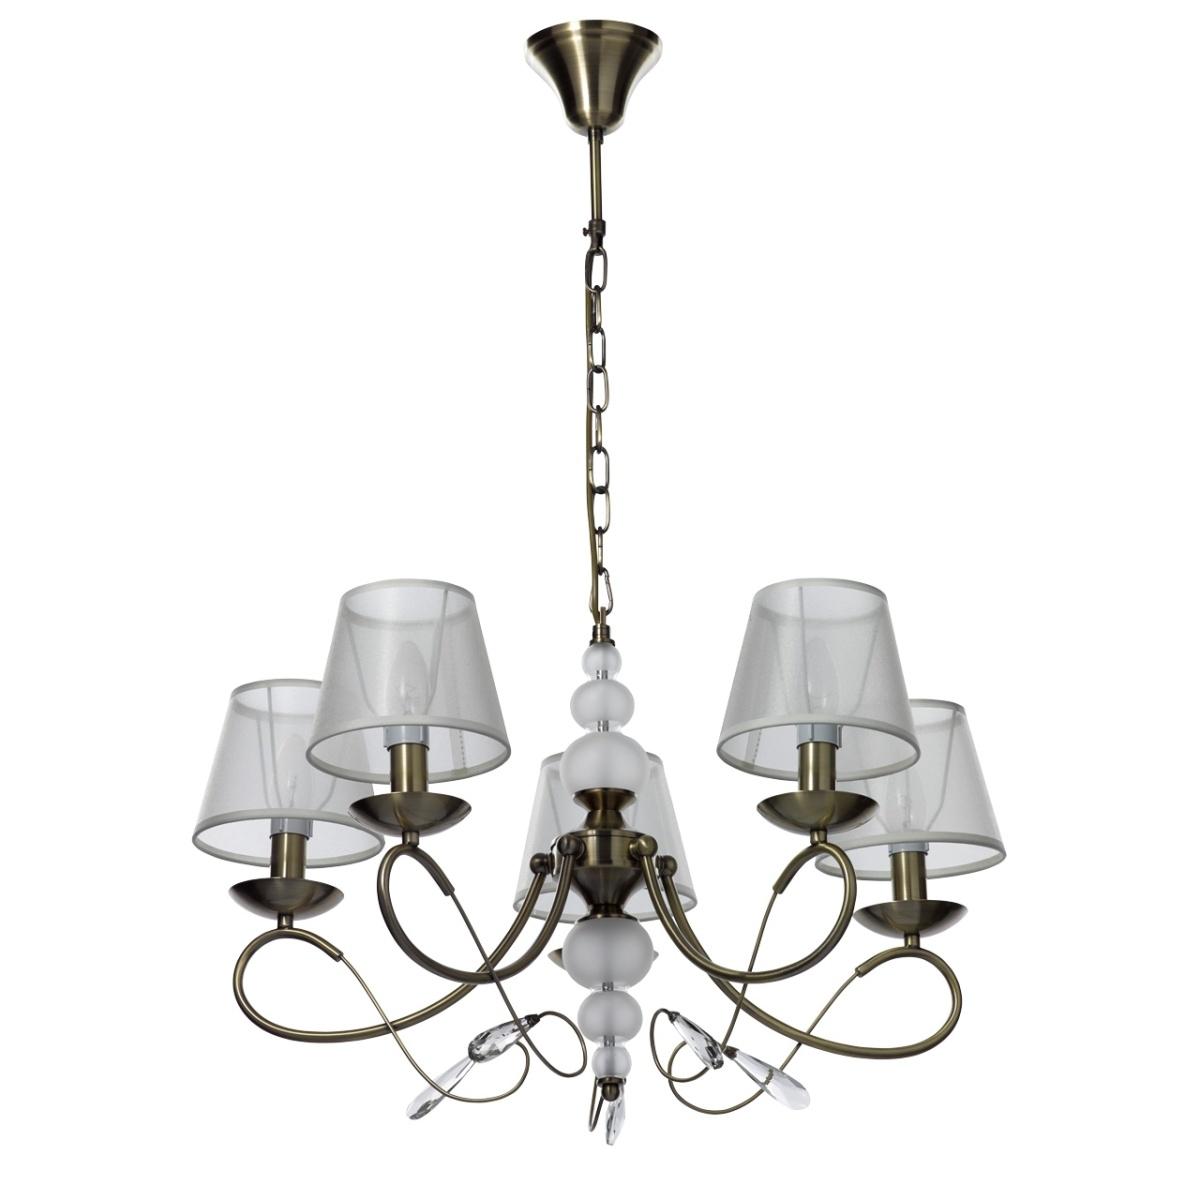 Candelabru MW-Light Elegance Federica 684012305 vivre.ro